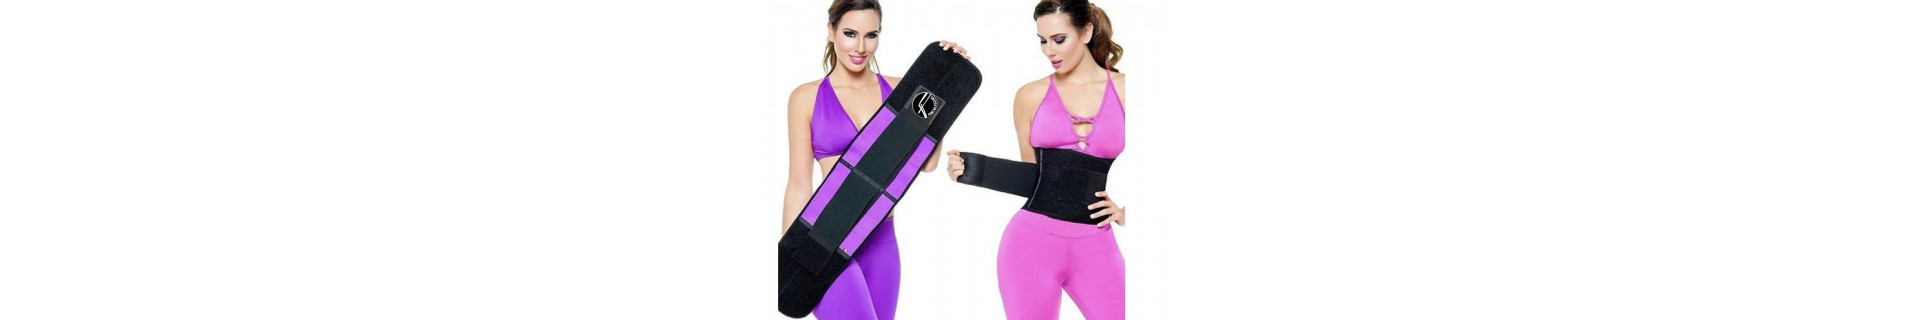 fasce stringivita modellanti, waist belt trainer